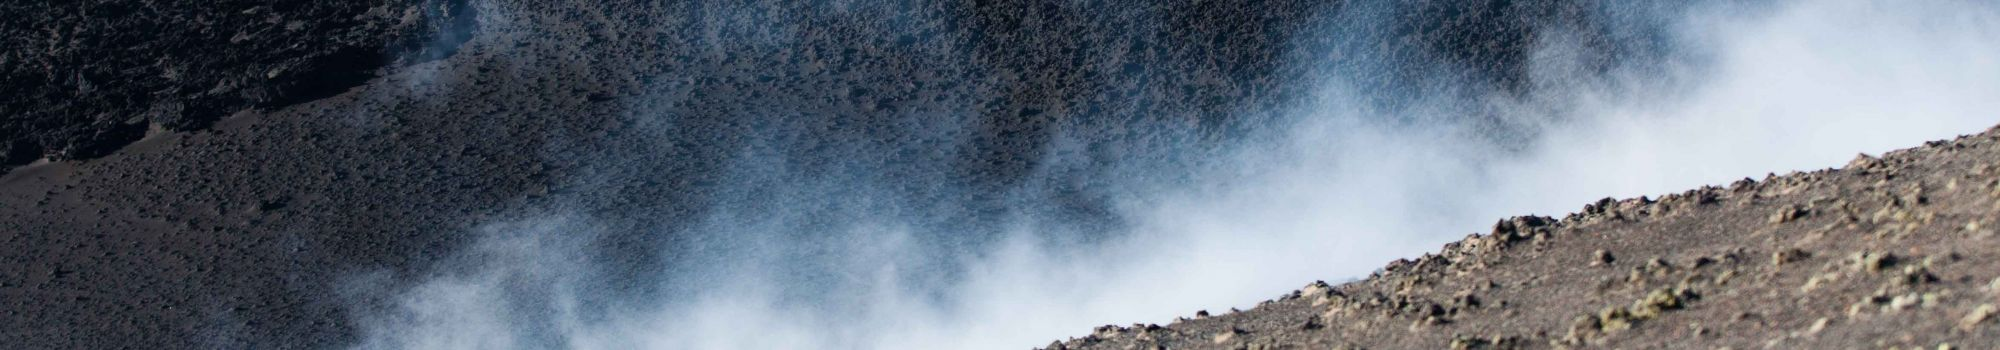 Thorsmork-Volcano-hike-Iceland1